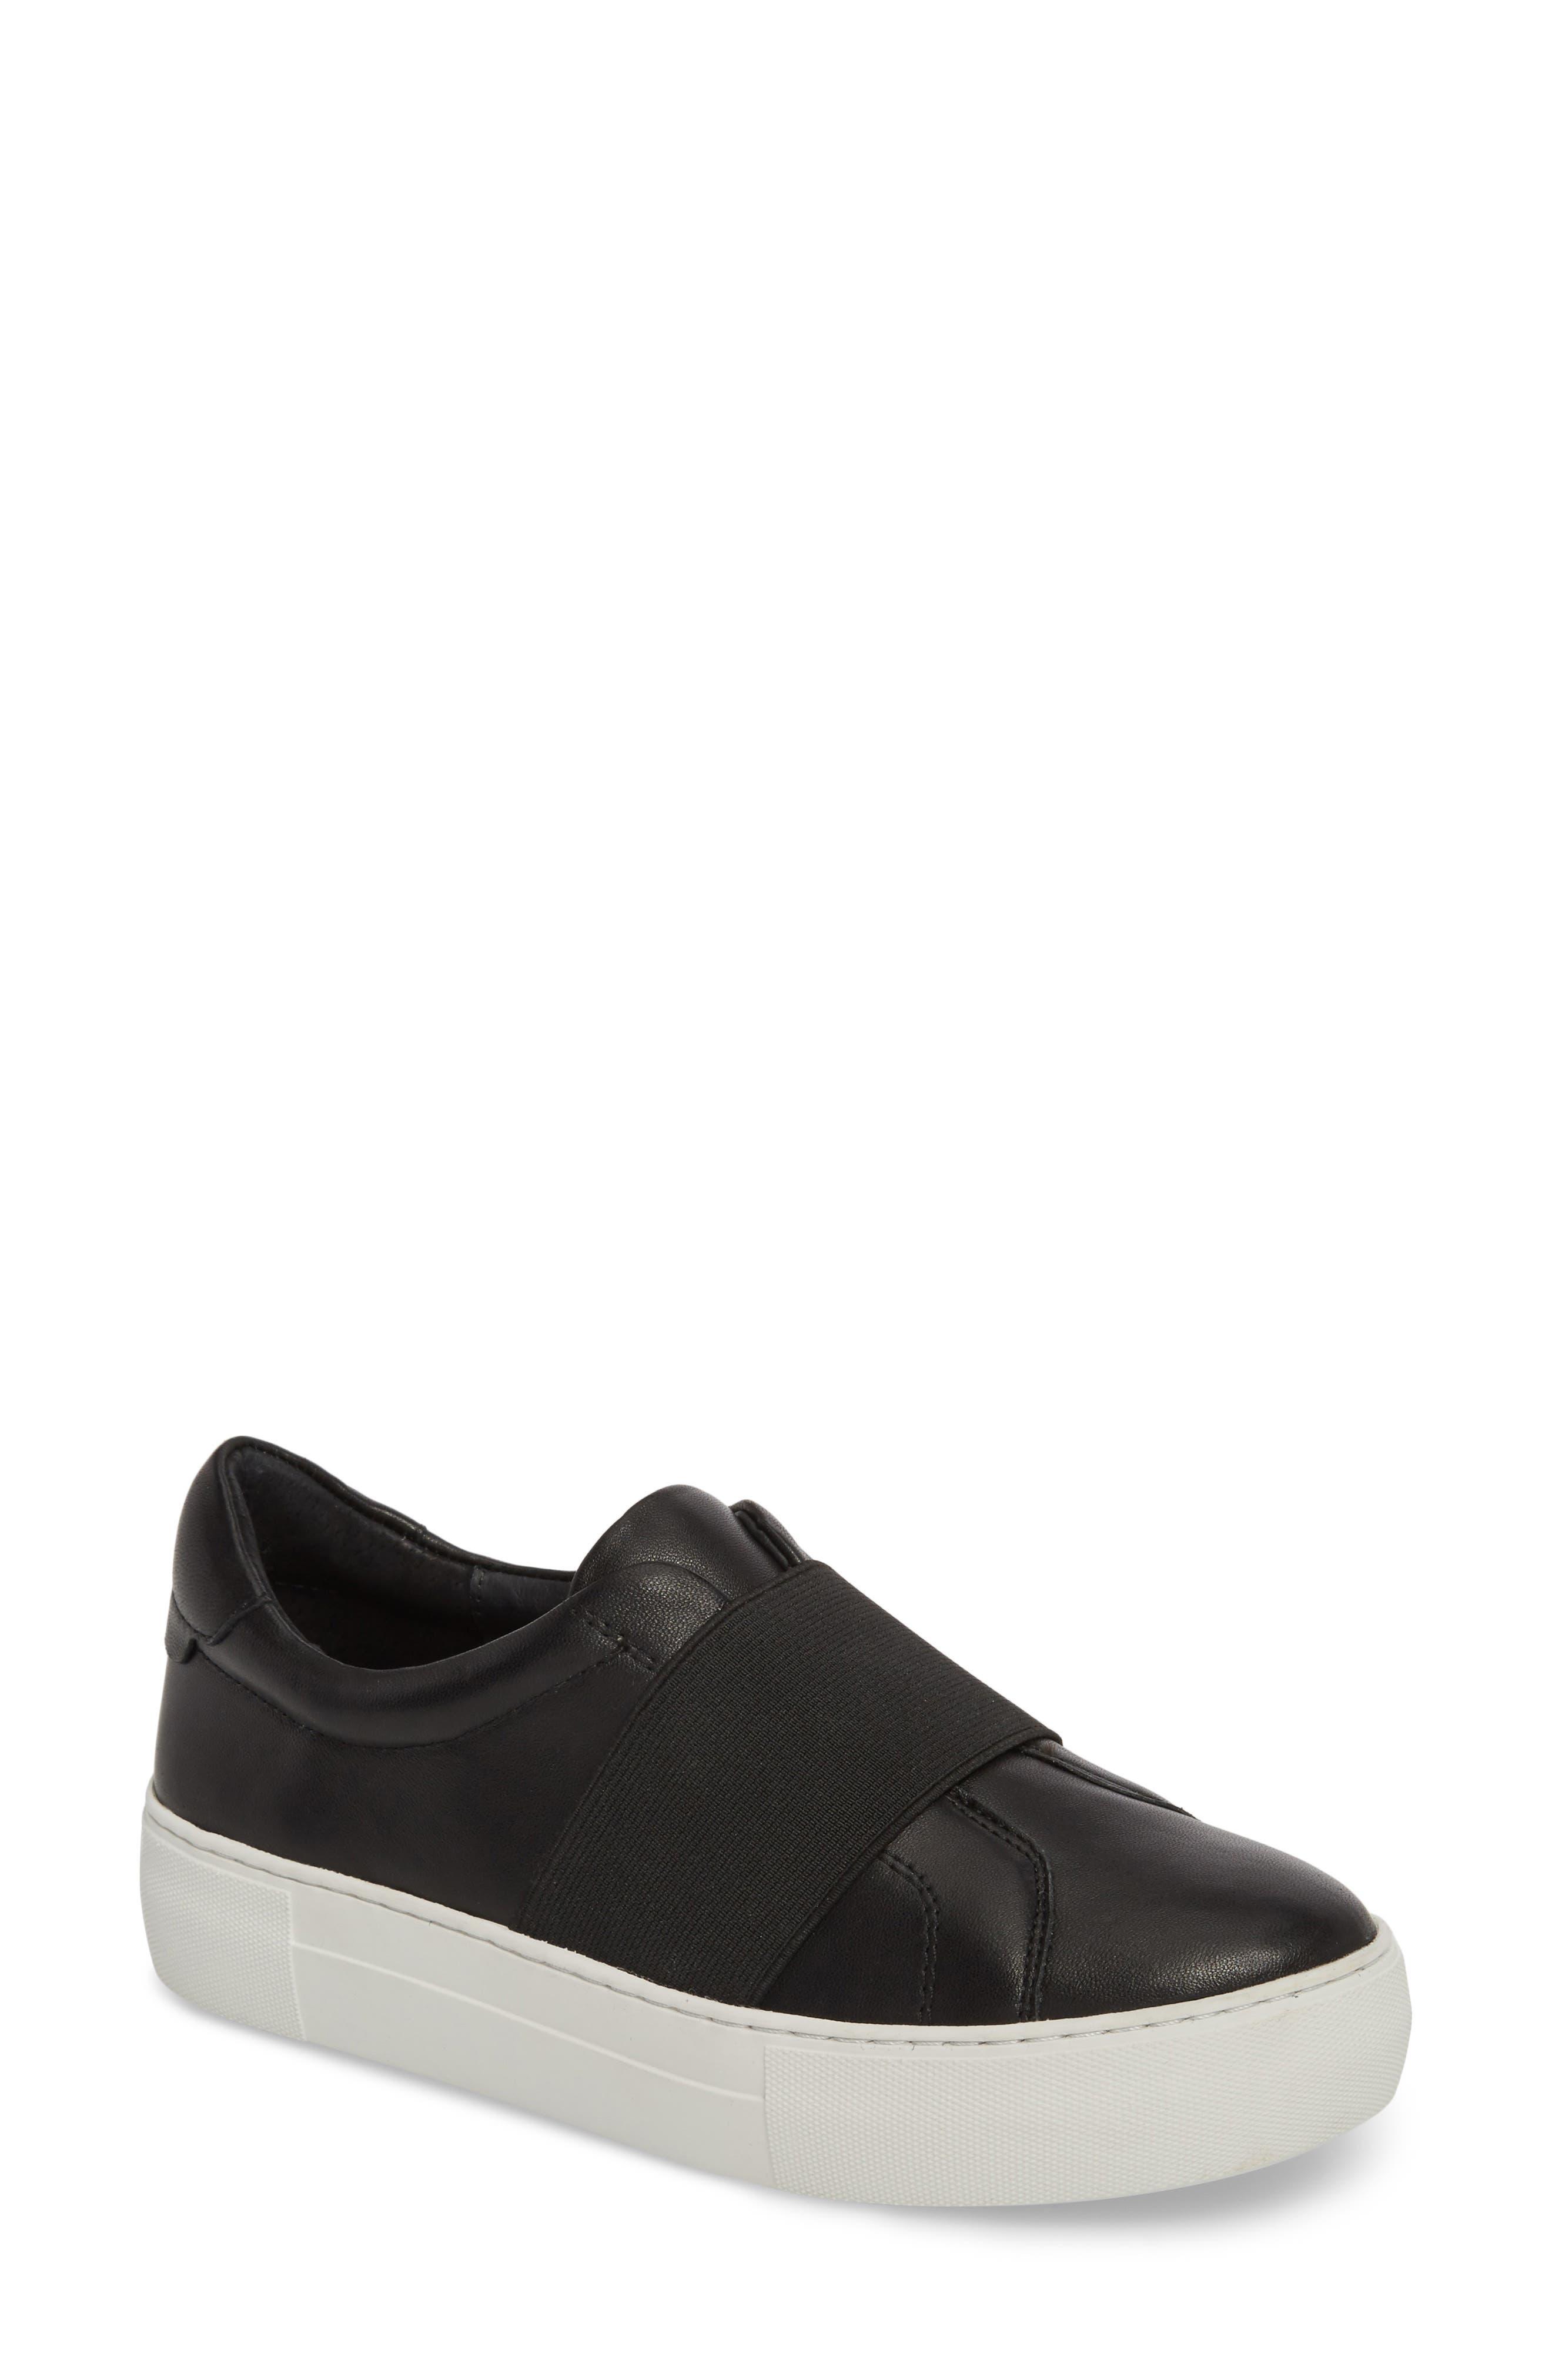 Adorn Slip-On Sneaker,                             Main thumbnail 1, color,                             BLACK/ BLACK LEATHER